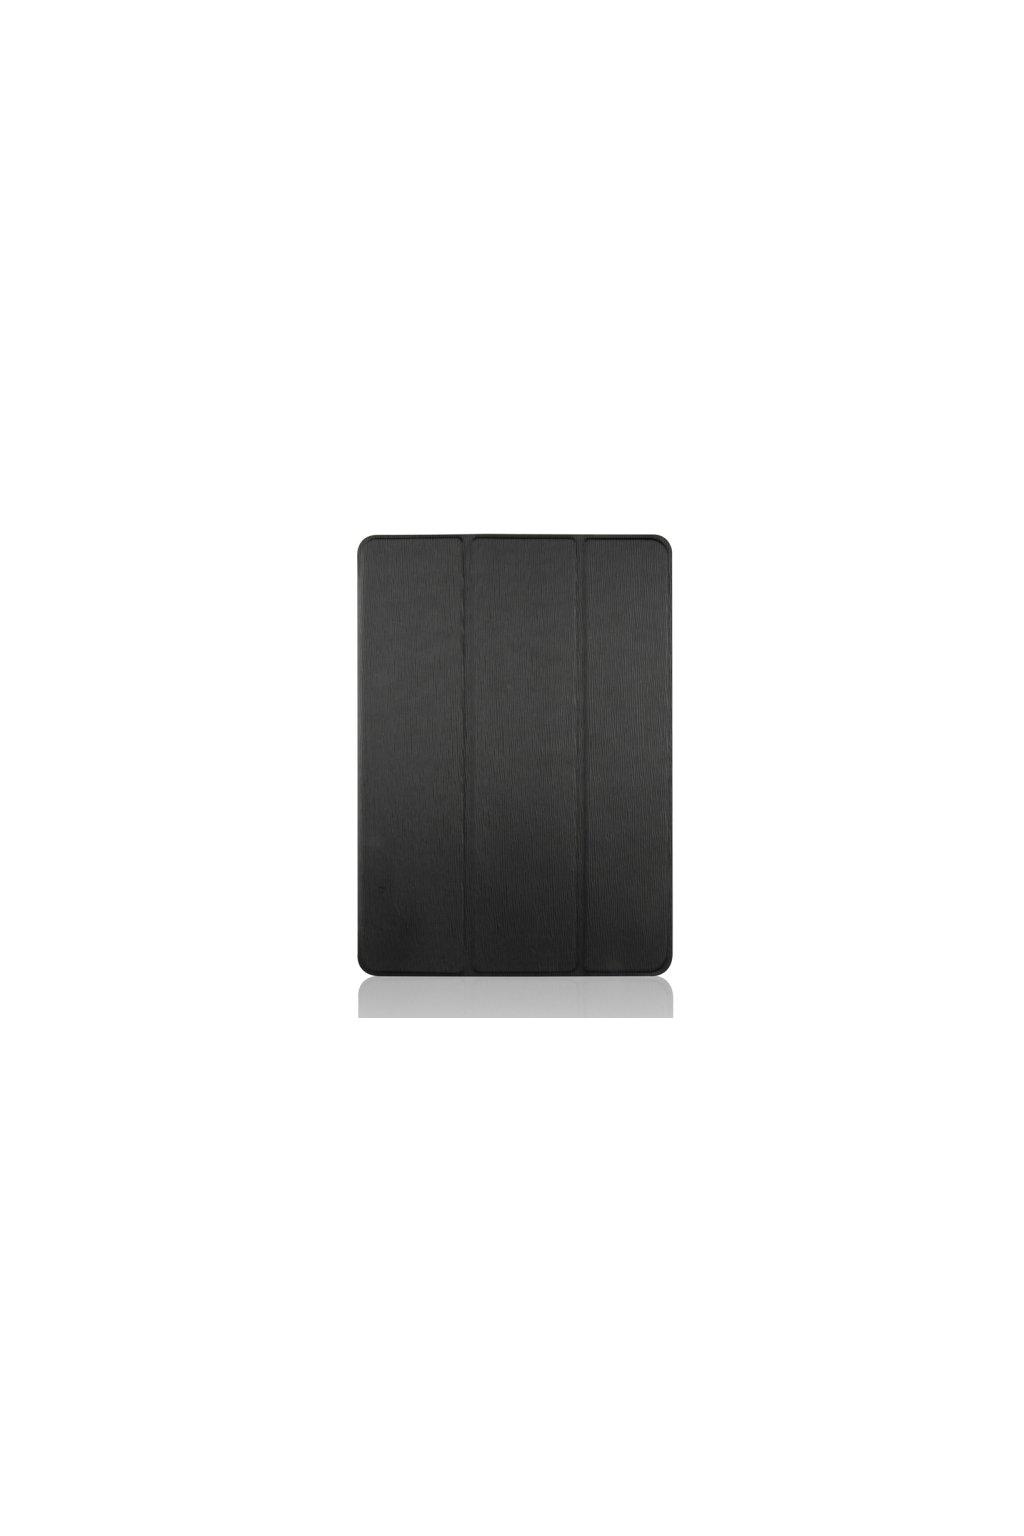 Pouzdro PU iPad Air 2, black/černá